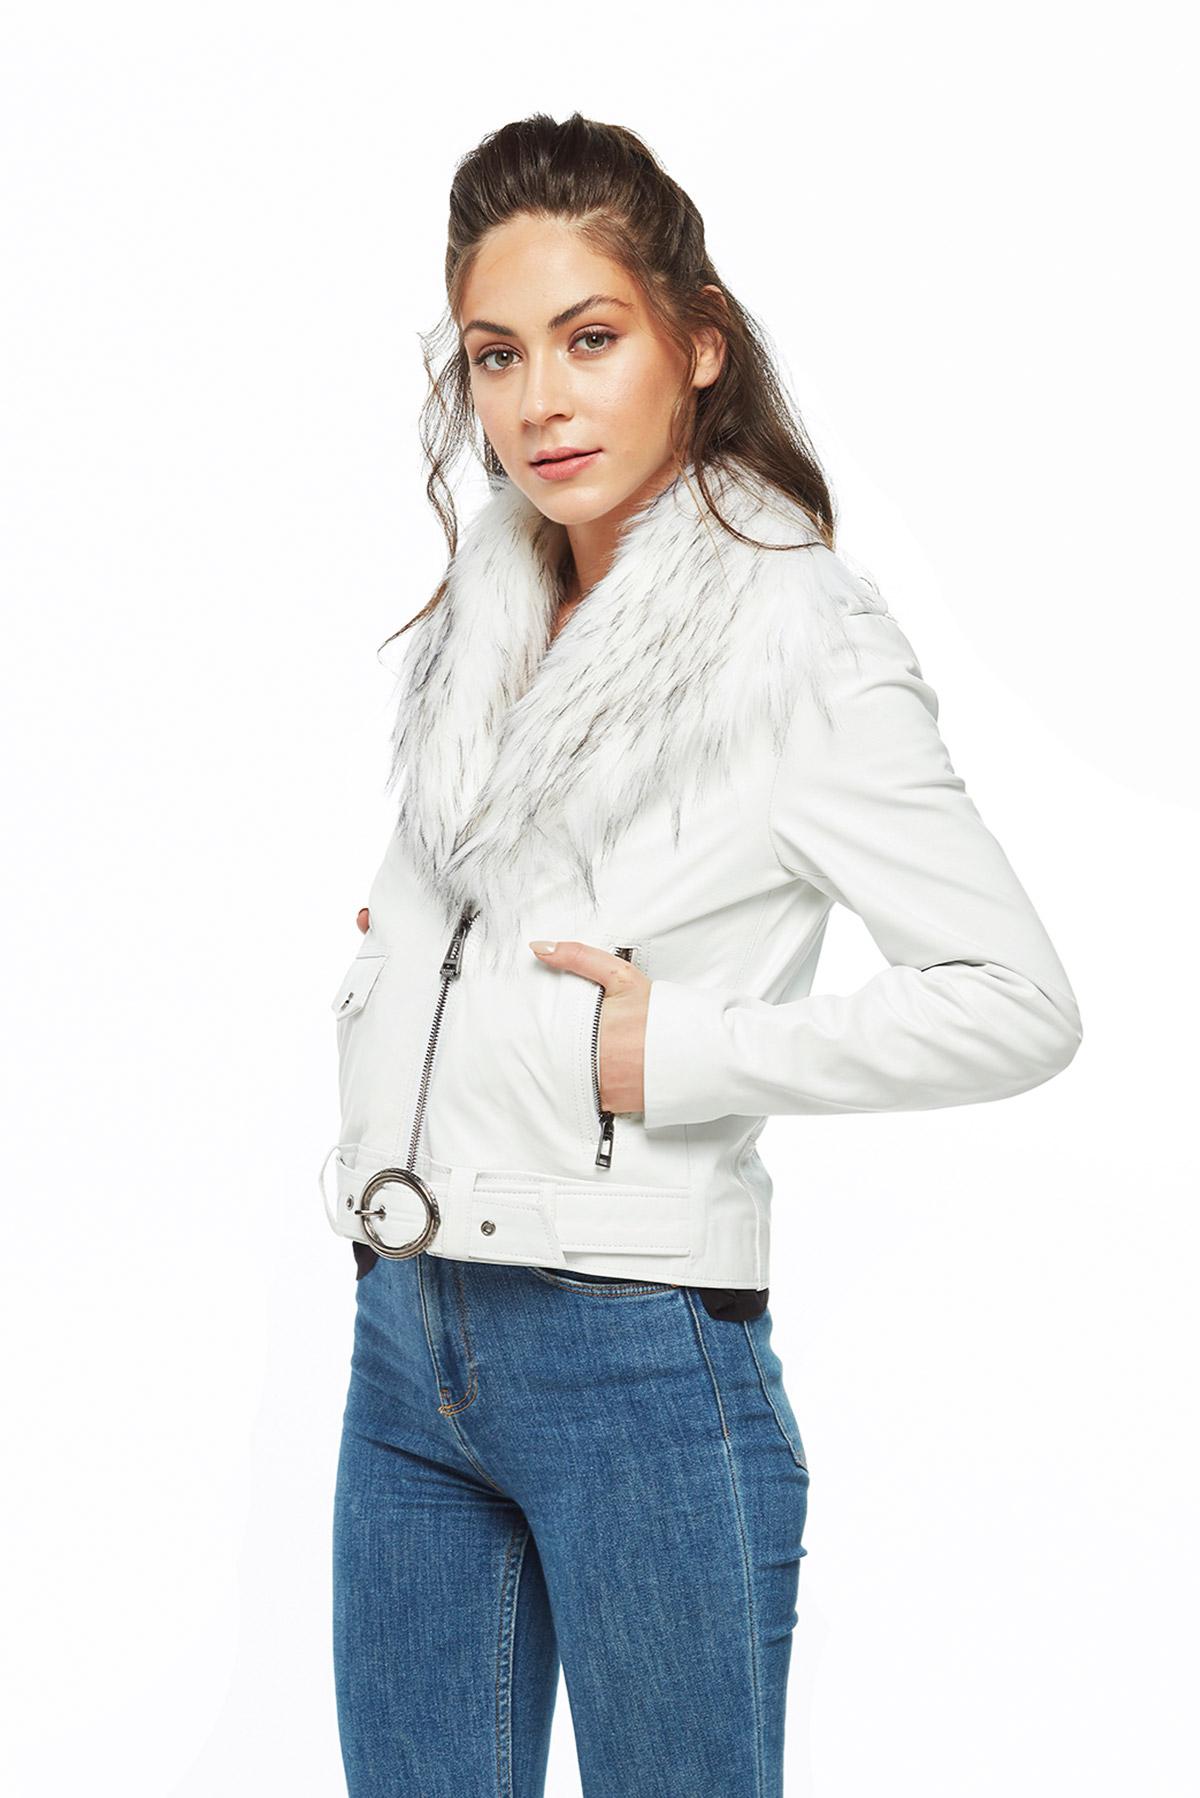 original leather jacket price